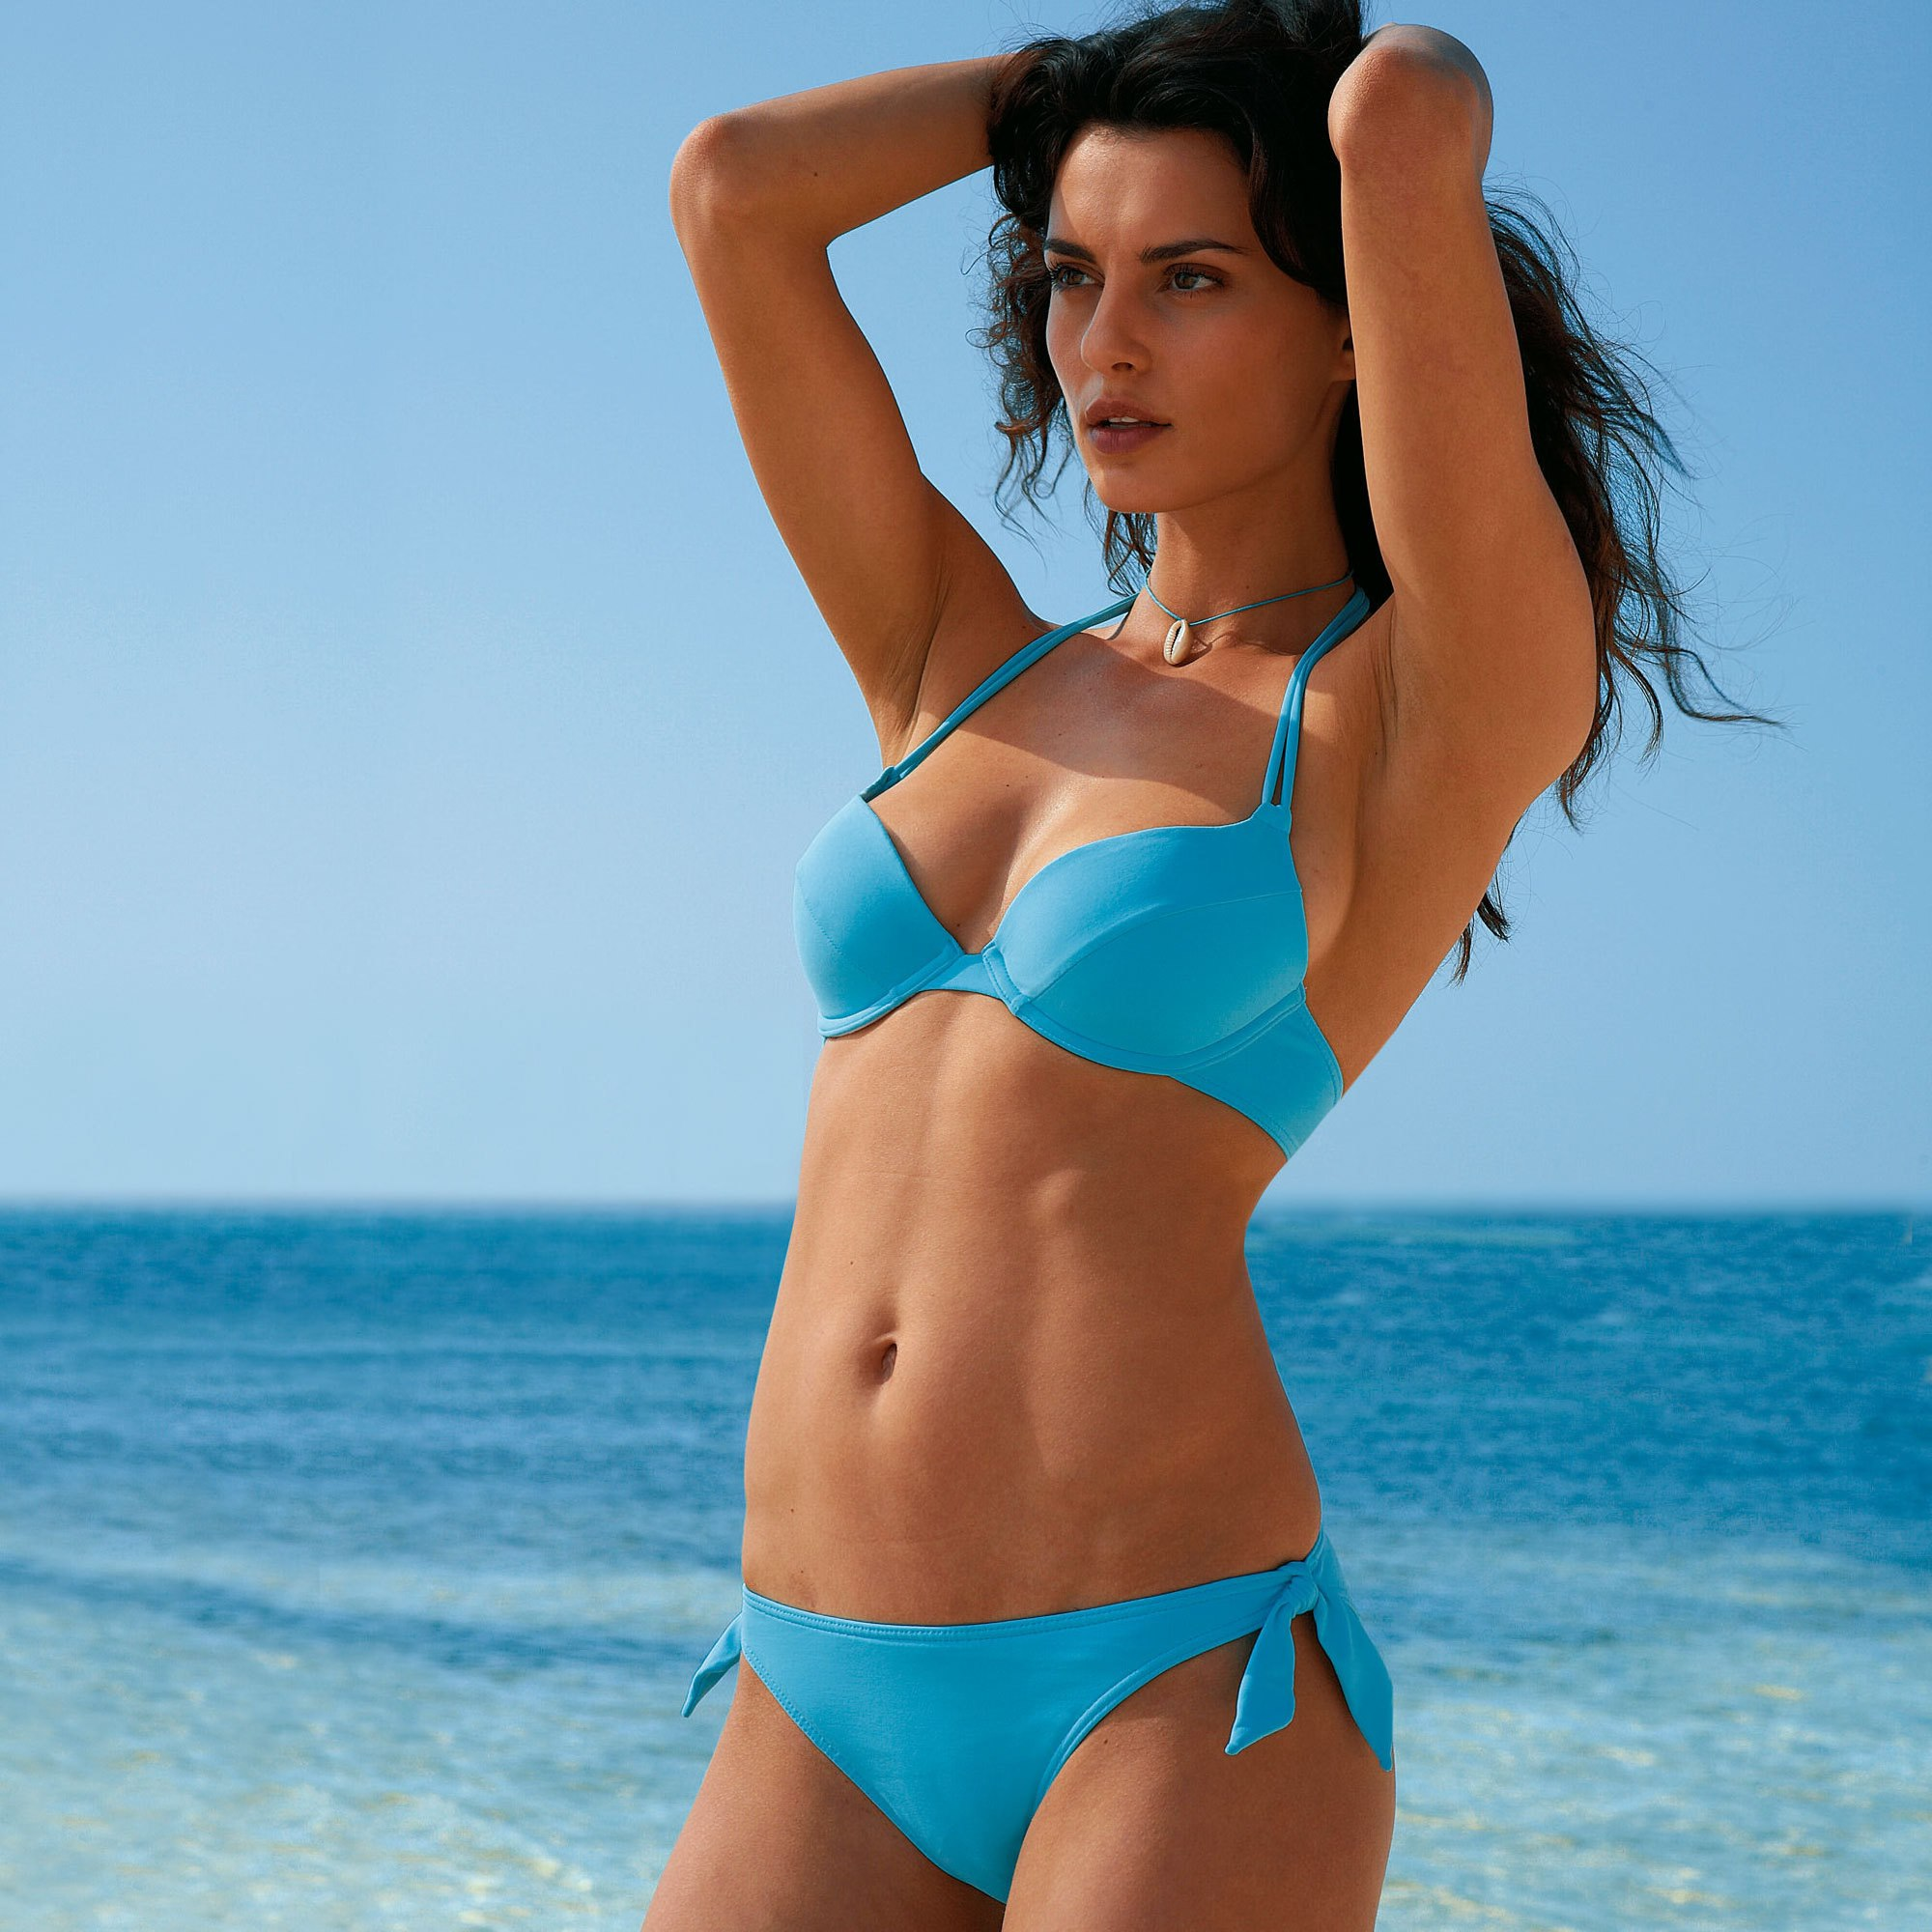 Models catrinel menghia for Water bra wiki